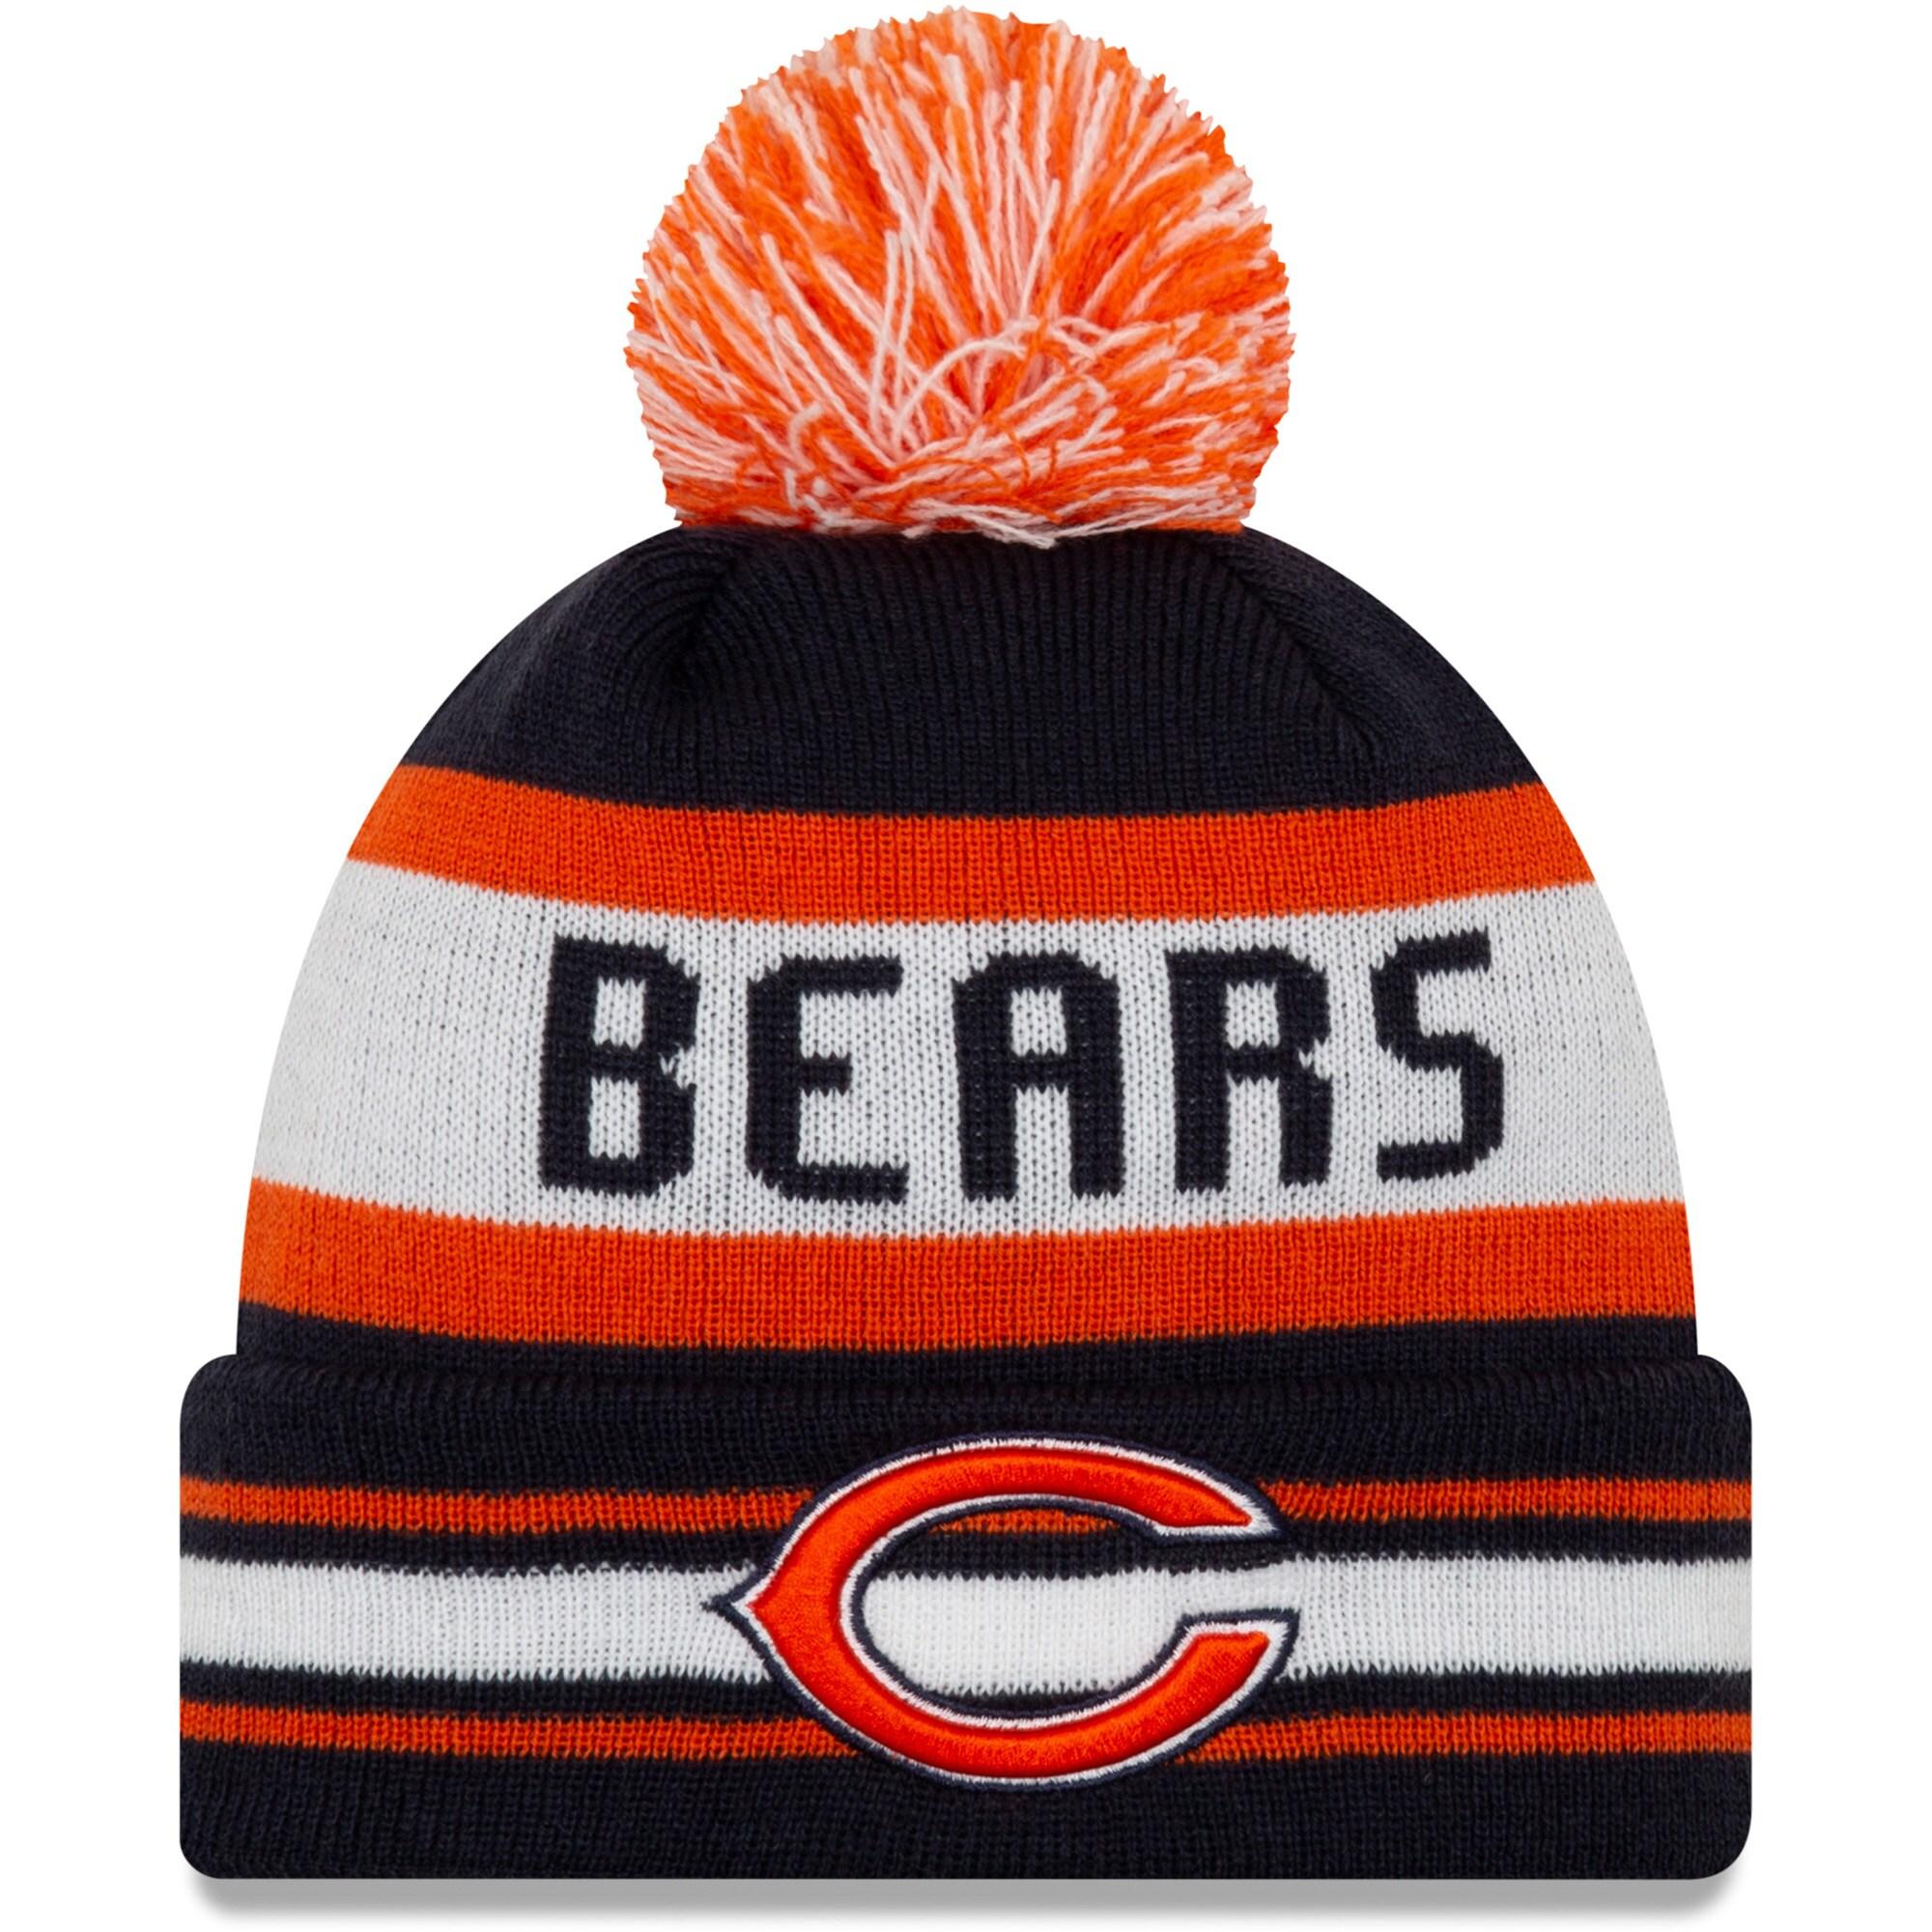 Chicago Bears New Era Jake Striped Cuffed Knit Hat with Pom - Navy